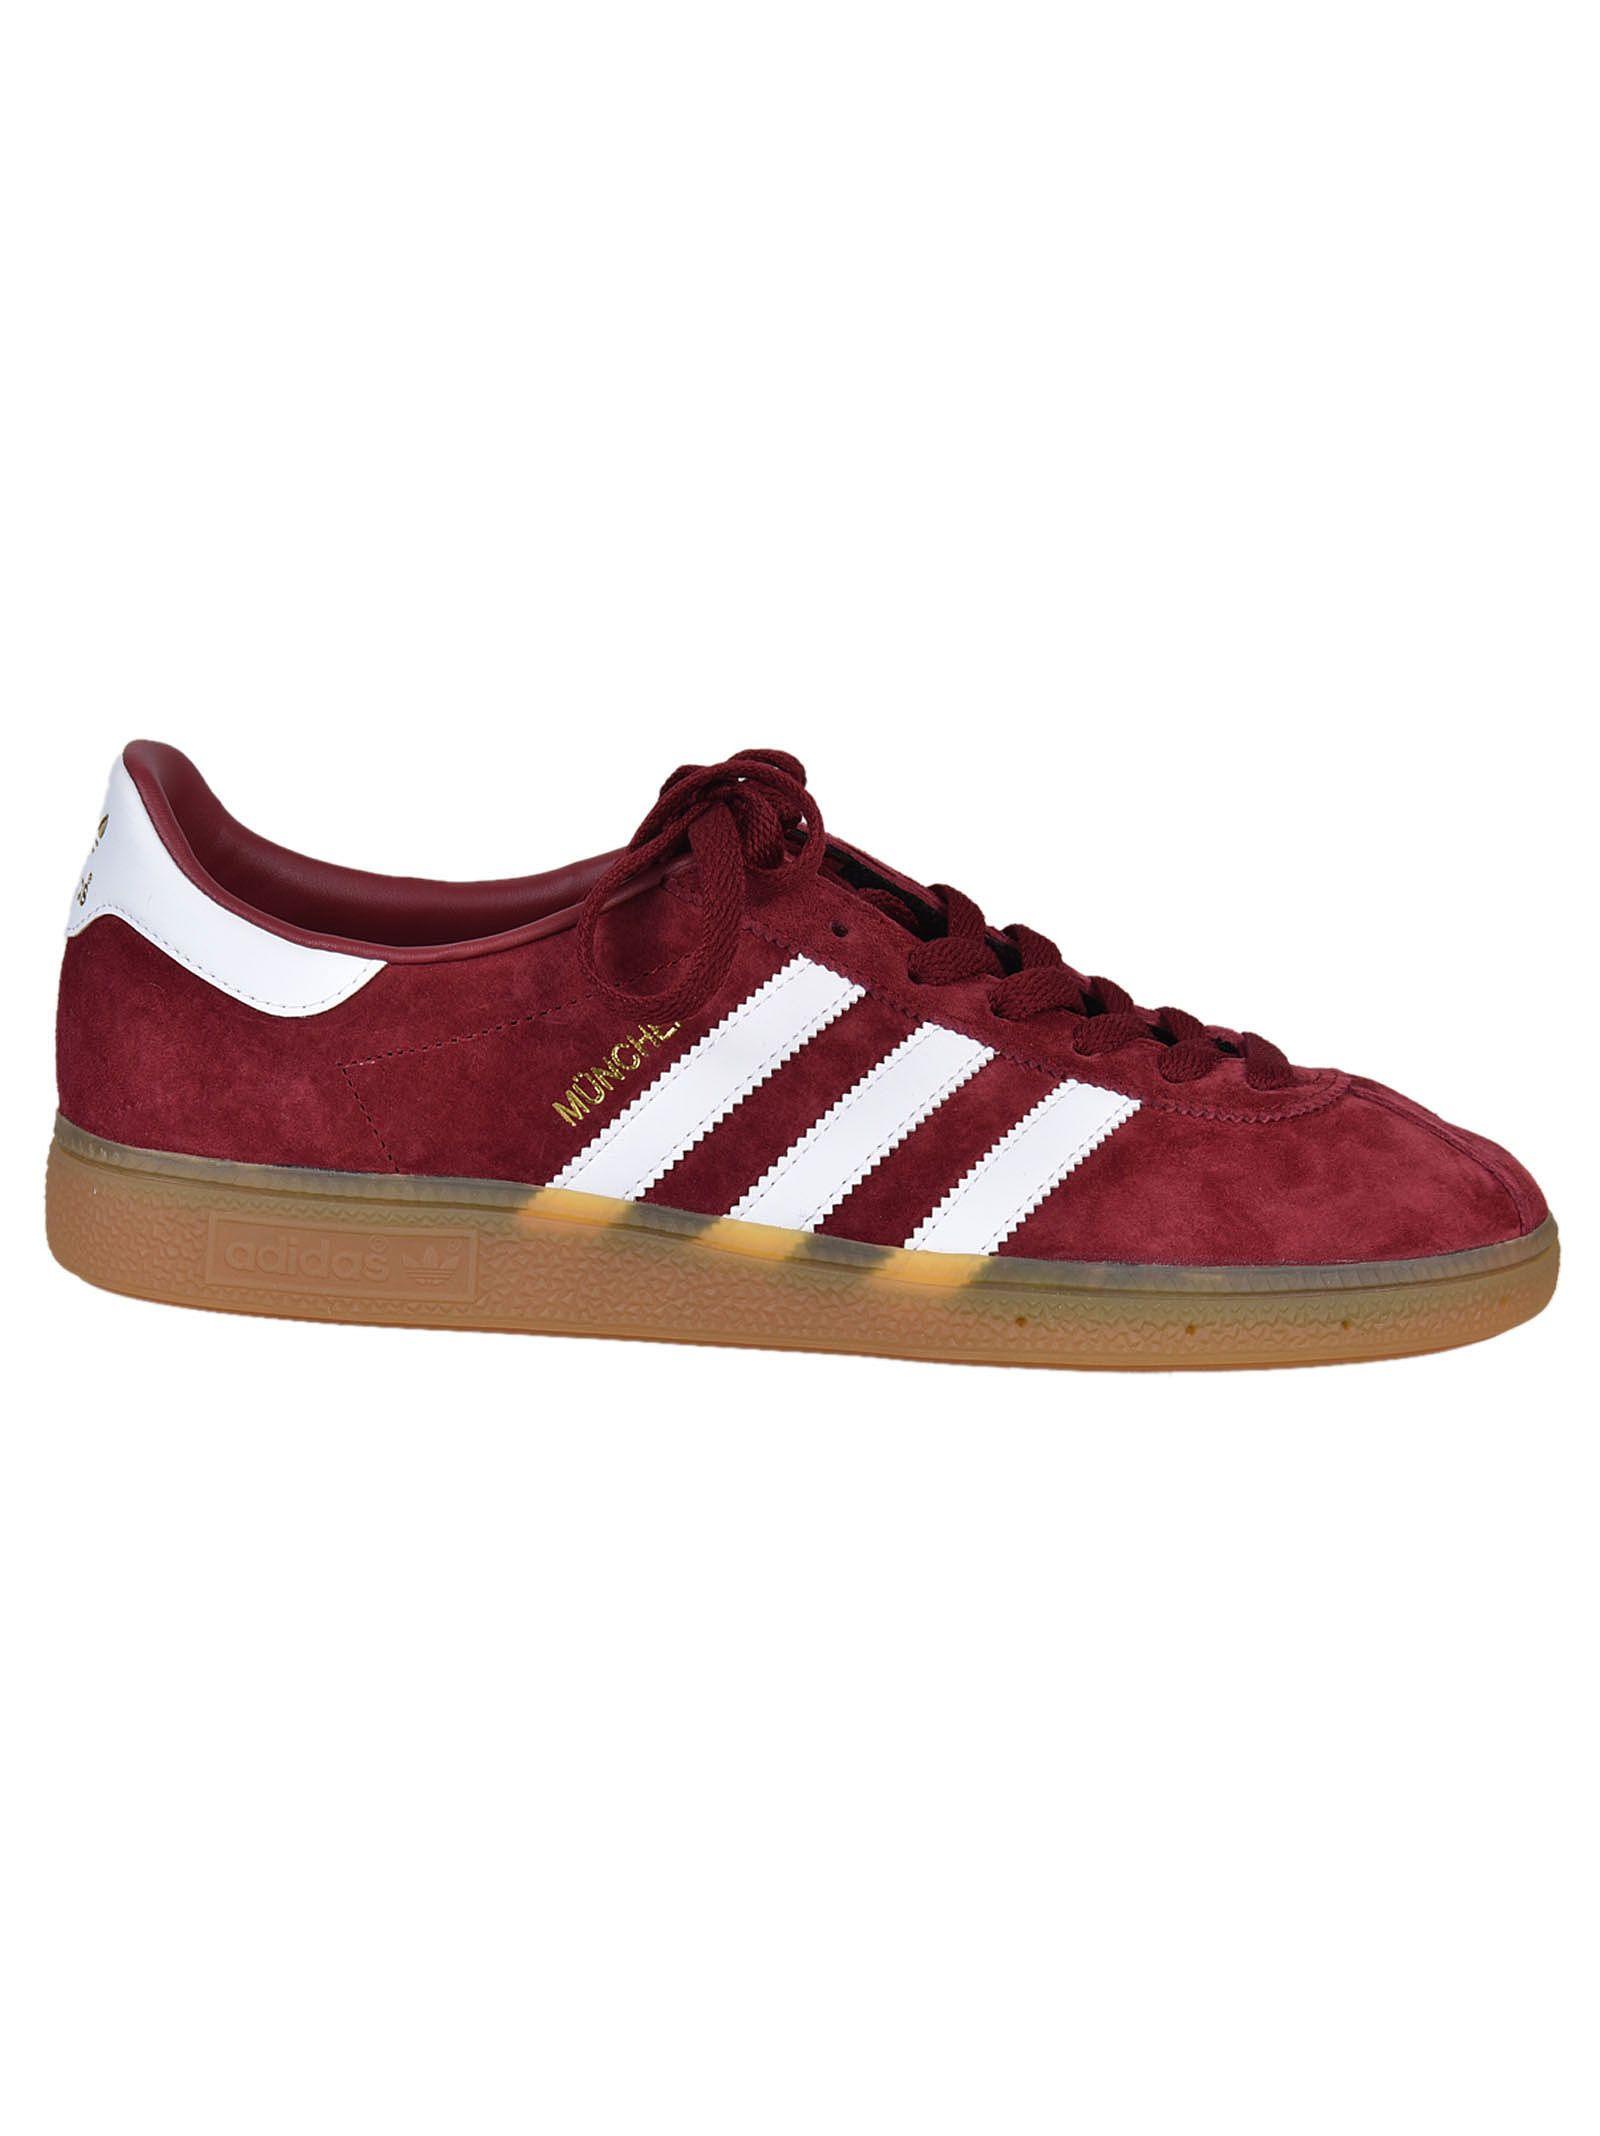 Adidas Munchen Sneakers